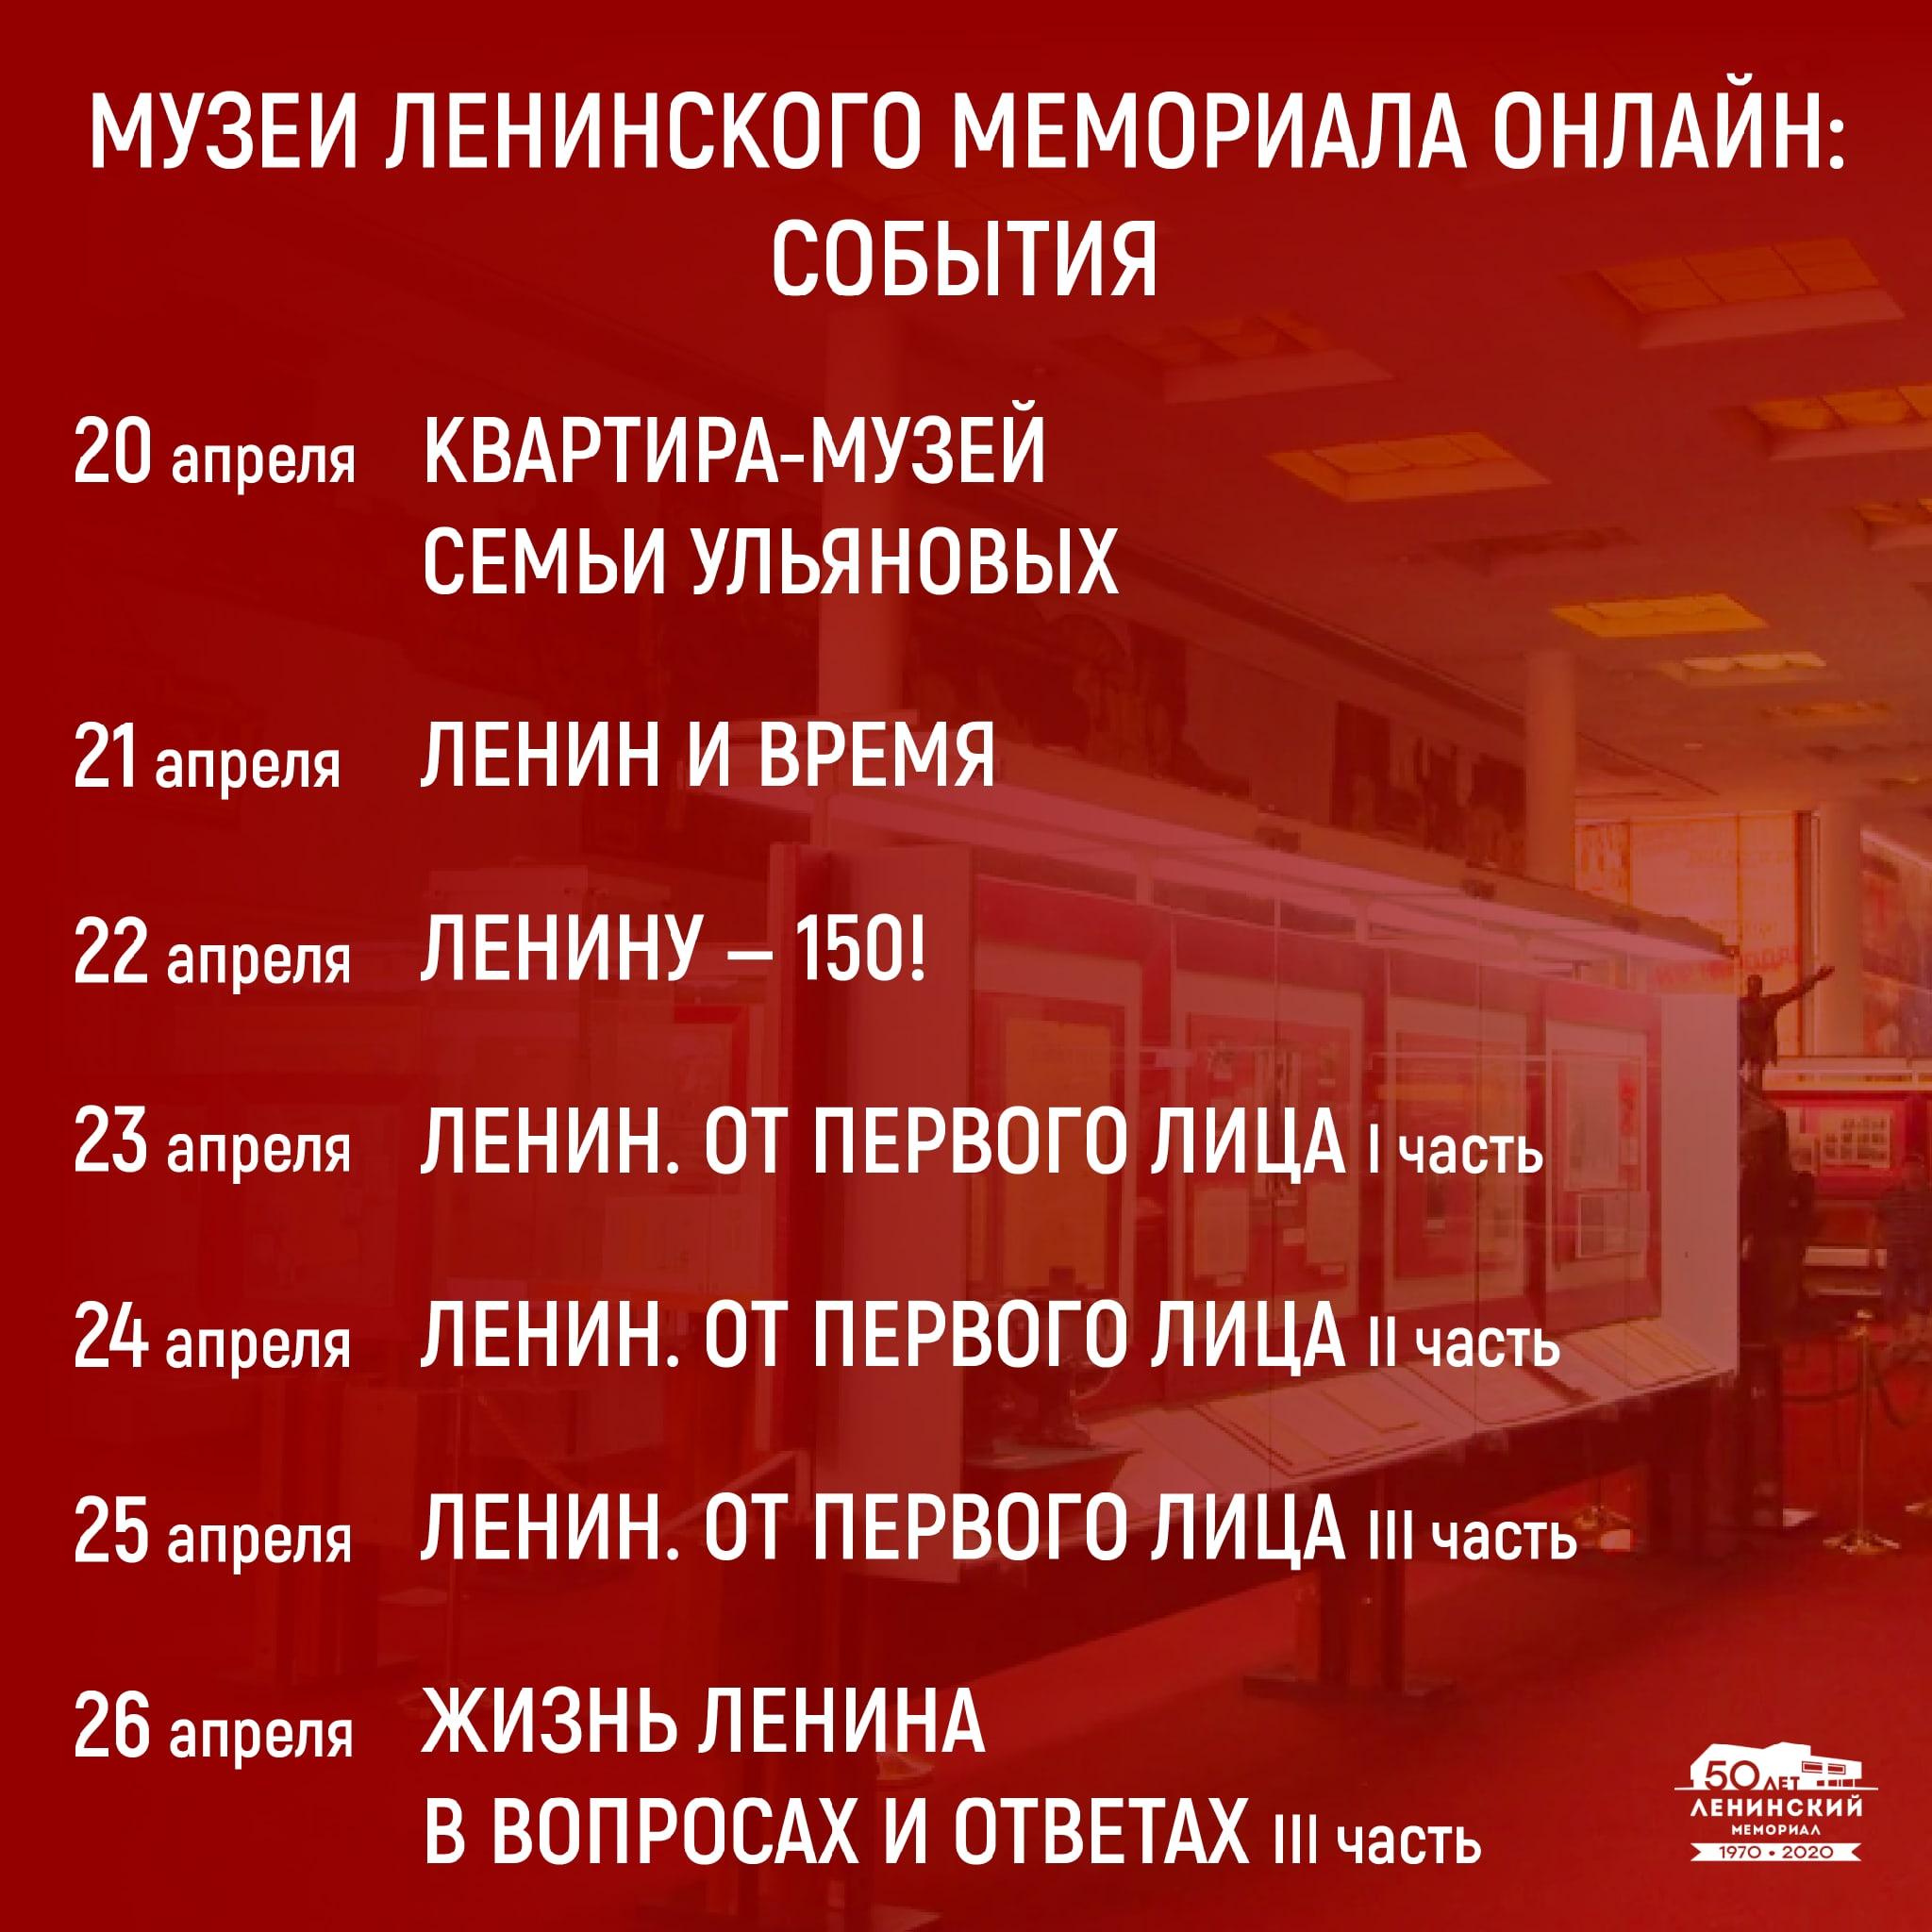 Музеи Ленинского мемориала, программа онлайн-мероприятий